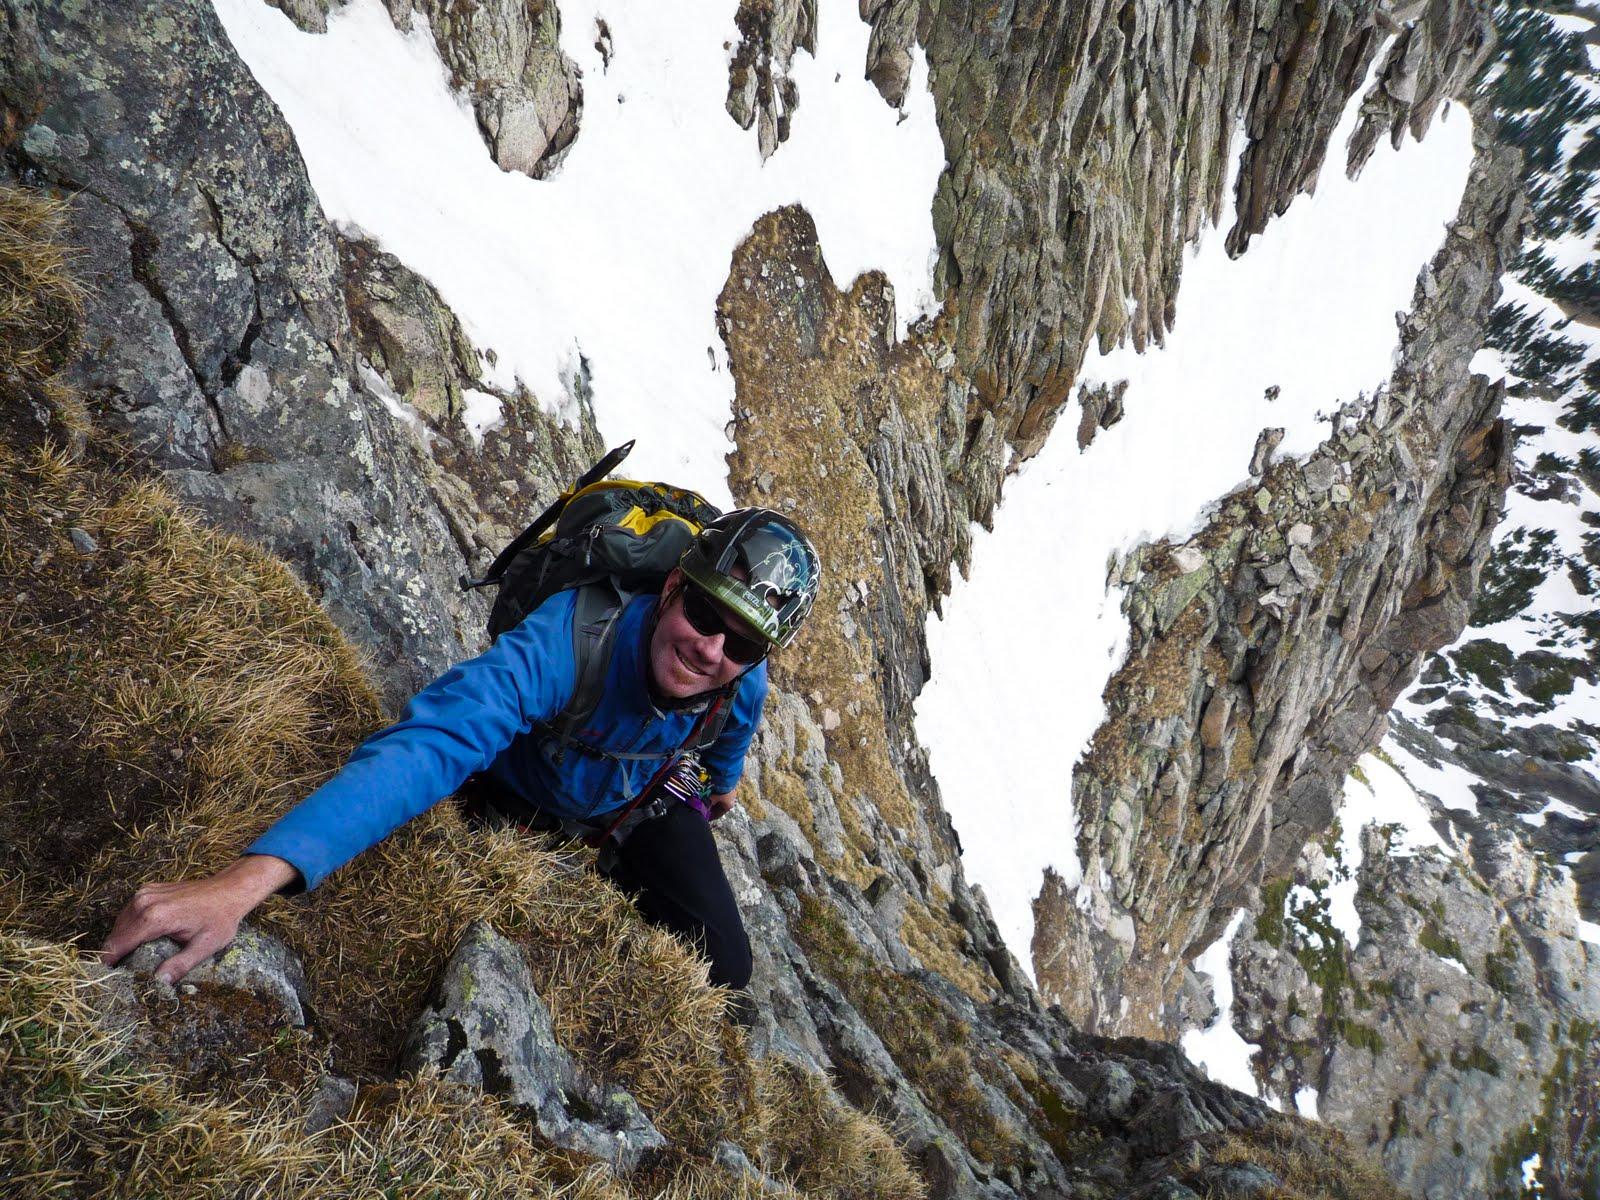 south central idaho amga alpine guides course rh scidaho blogspot com Alpine Guides Yellowstone alpine guide certification